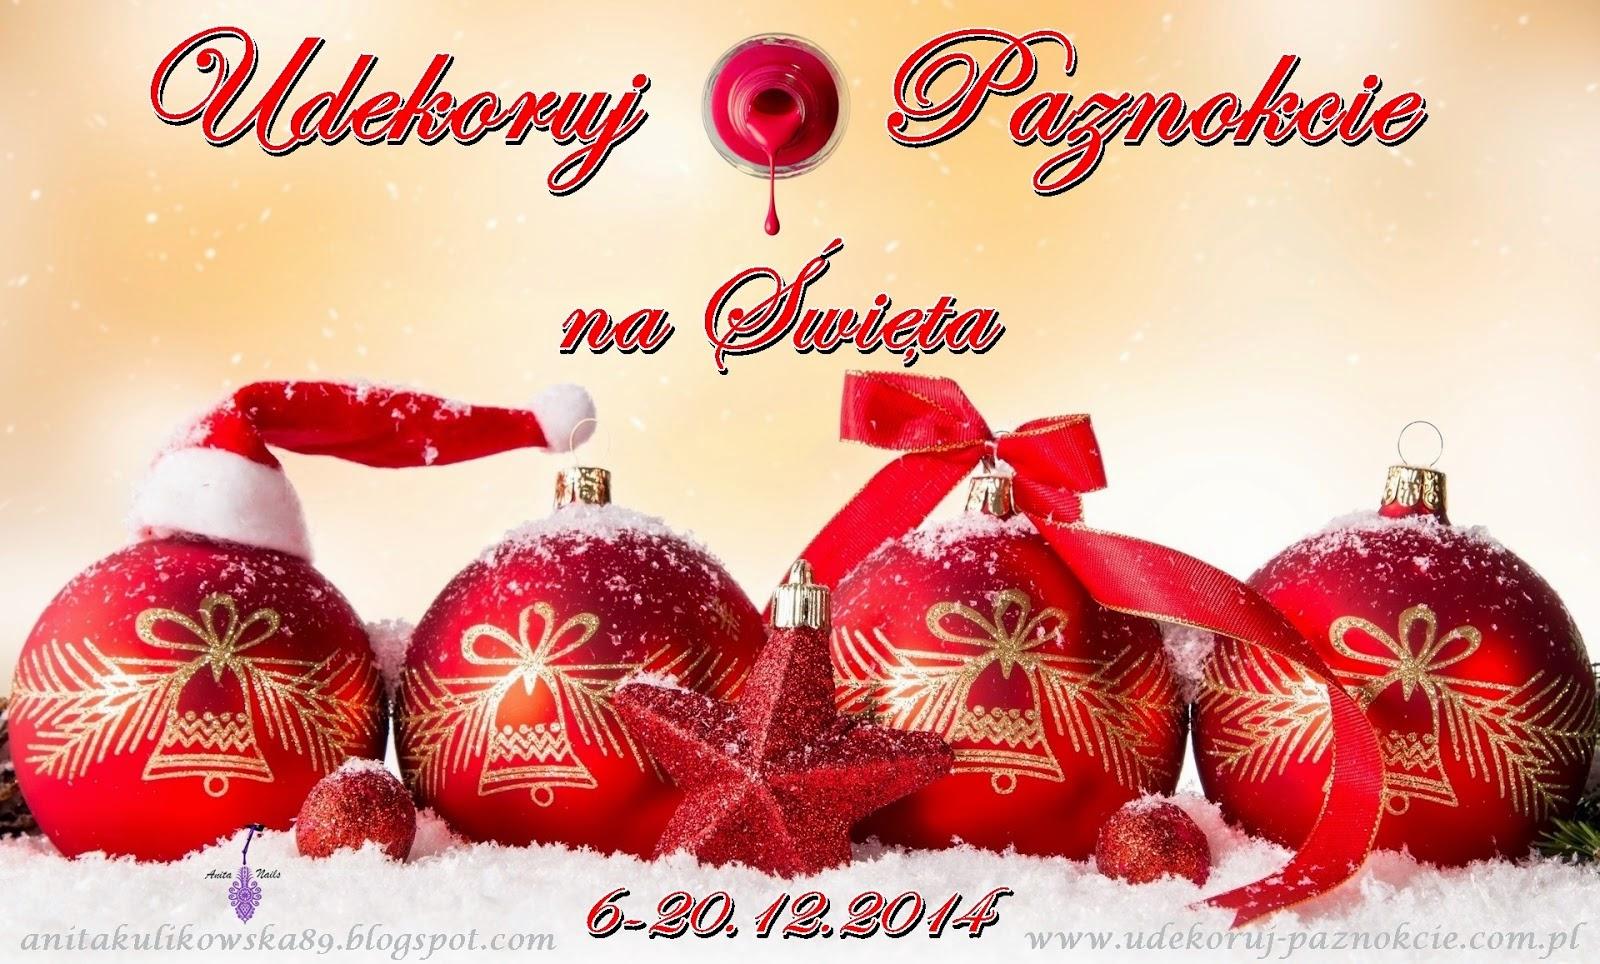 http://anitakulikowska89.blogspot.com/2014/12/konkurs-udekoruj-paznokcie-na-swieta.html